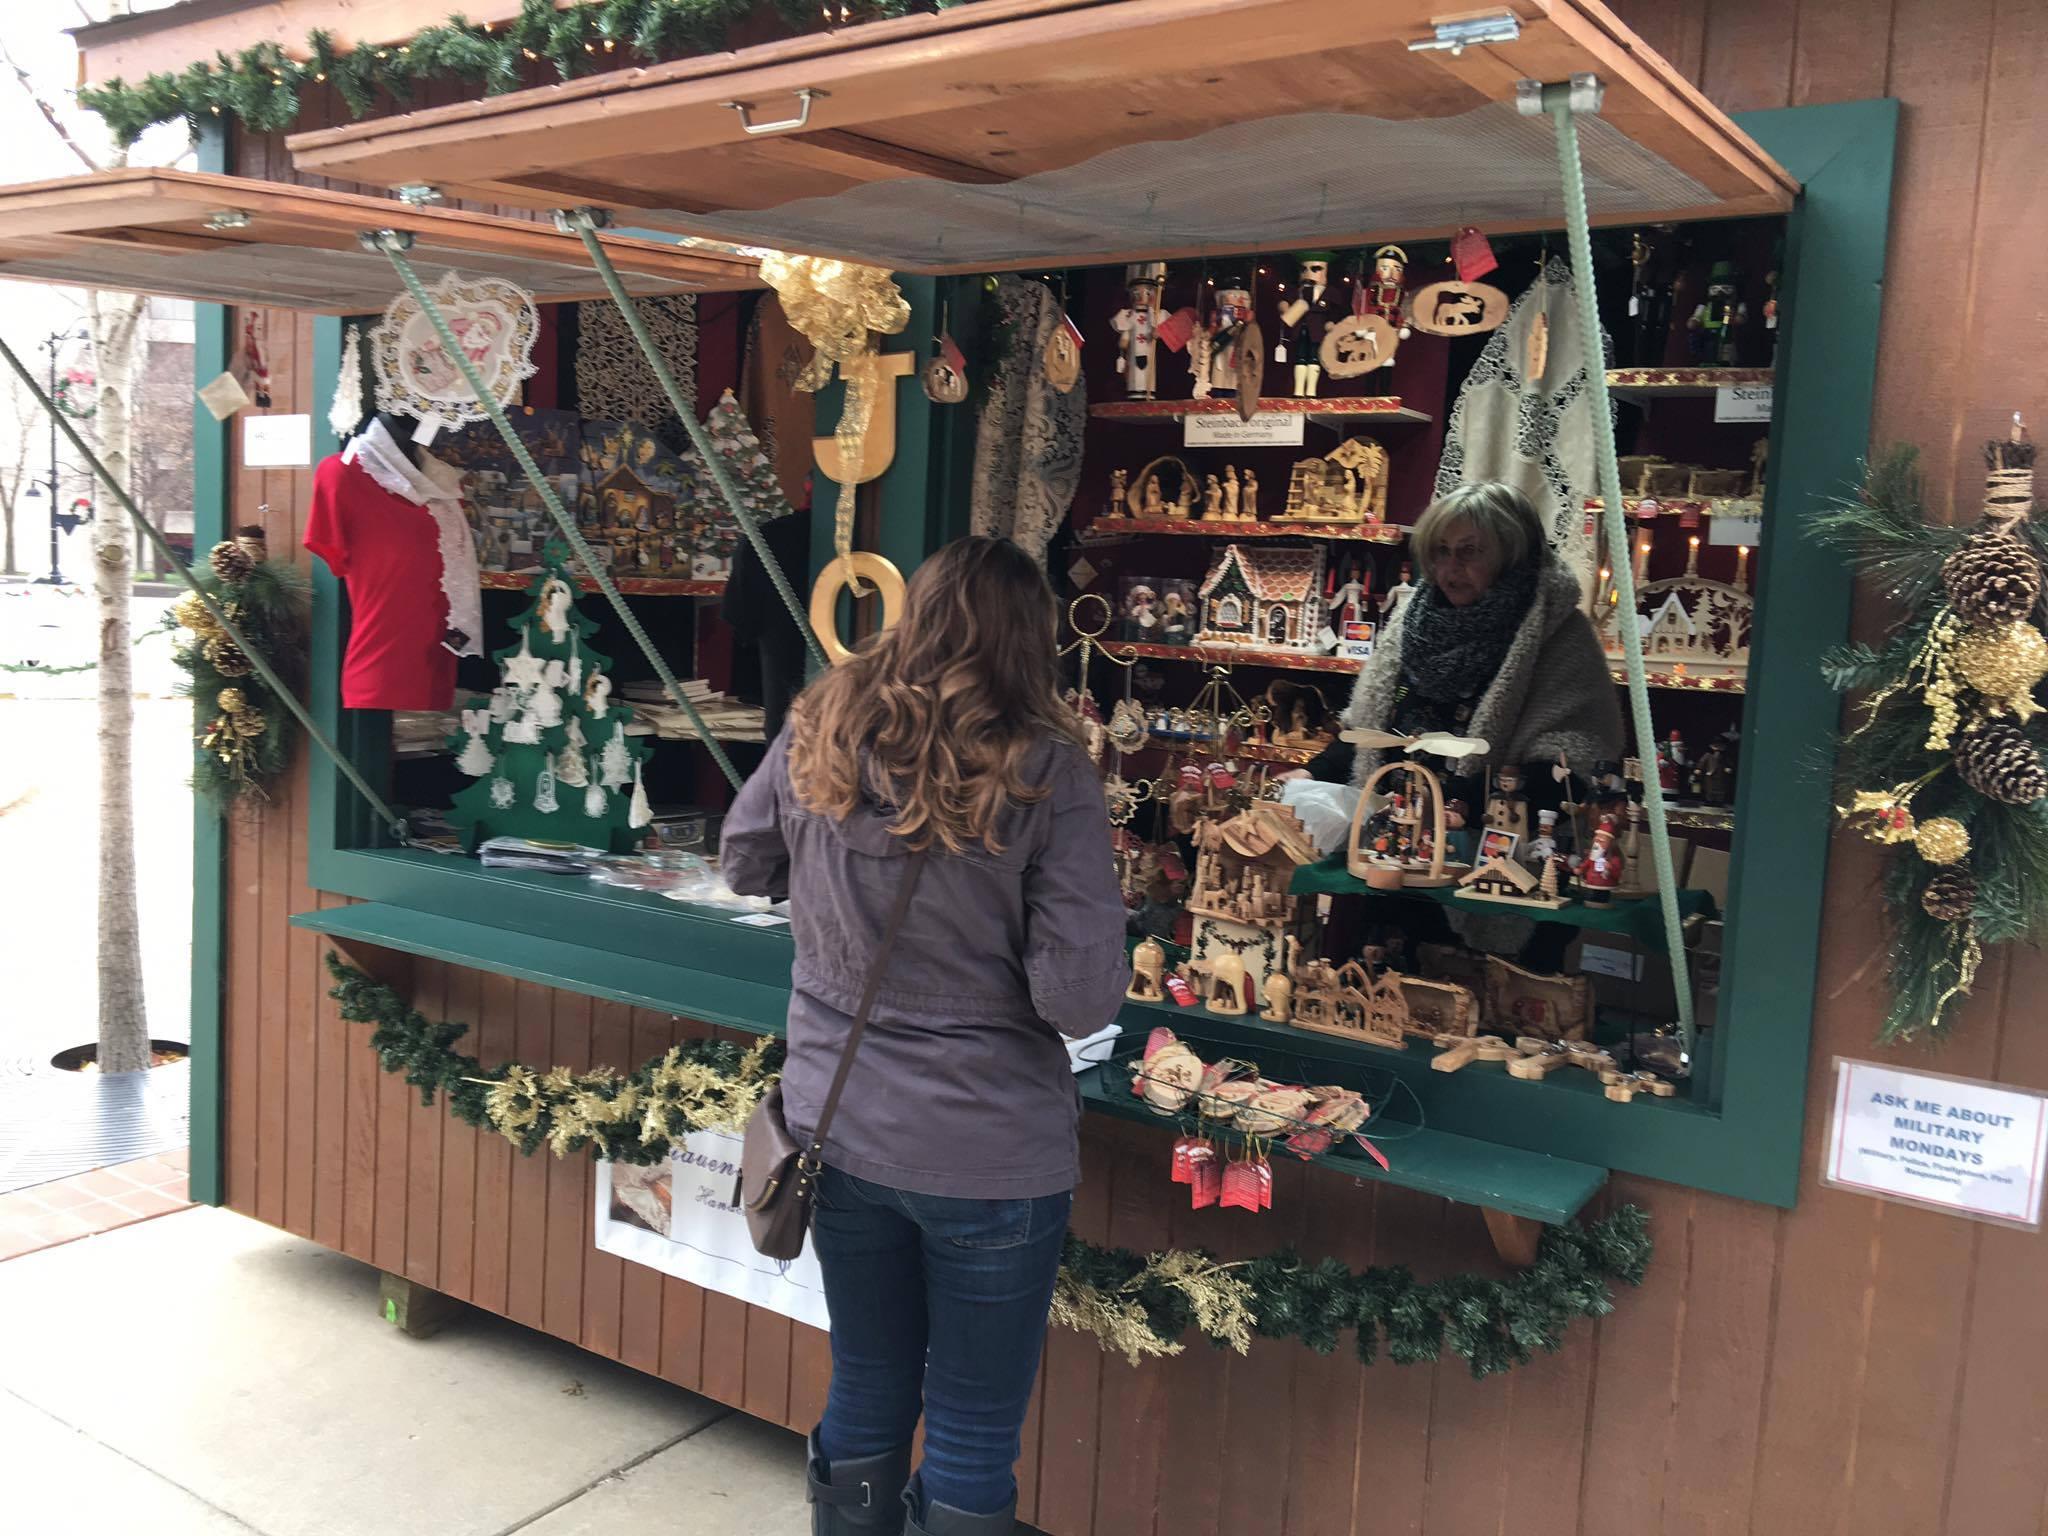 Belleville Il Christmas Market 2021 The Belleville Christkindlmarkt Is The Best German Christmas Market In Illinois